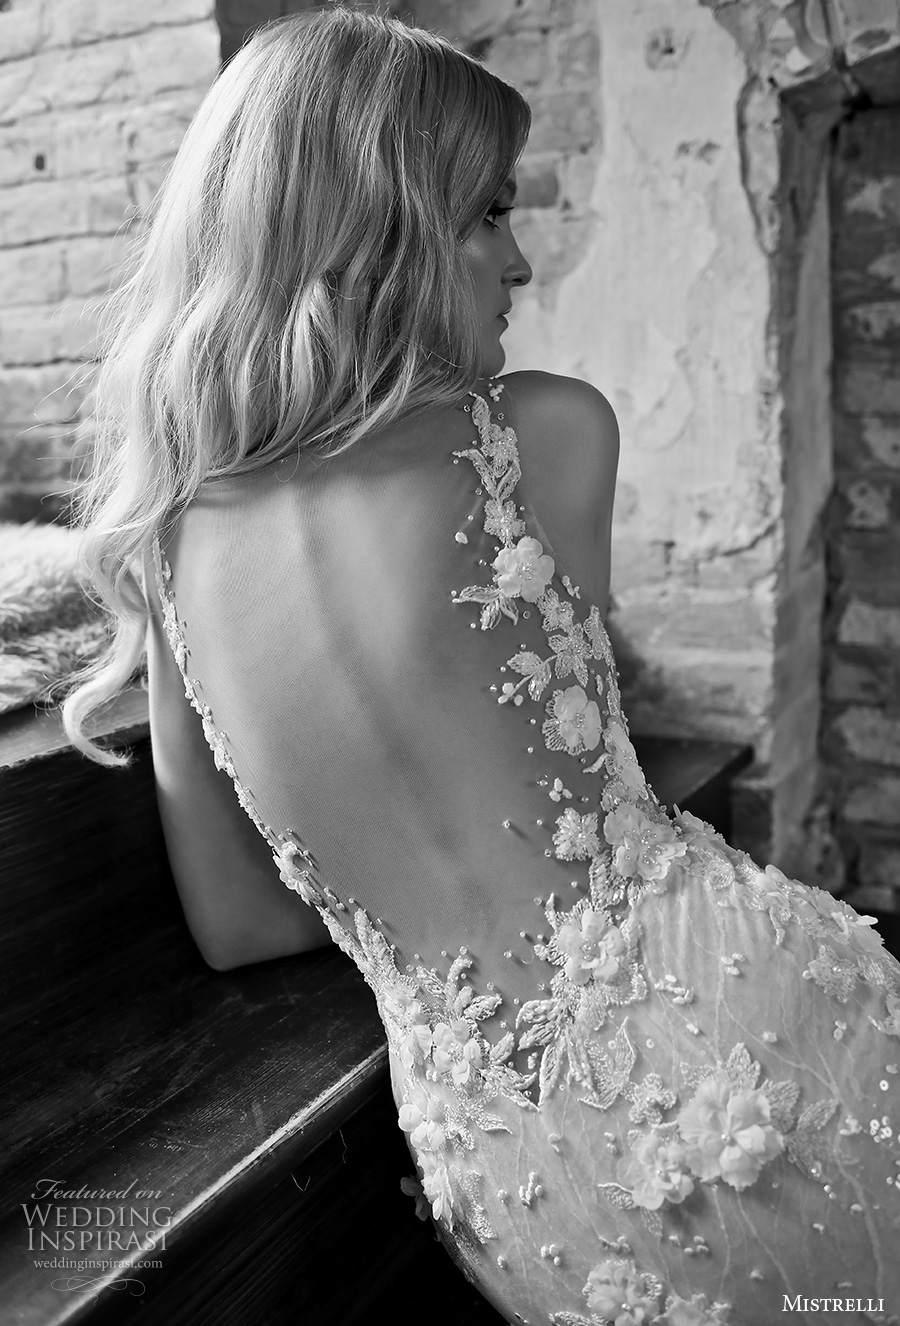 mistrelli 2021 royal drama bridal sleeveless thin strap deep plunging v neck full embellishment glamorous elegant sheath wedding dress backless low back medium train (4) zbv